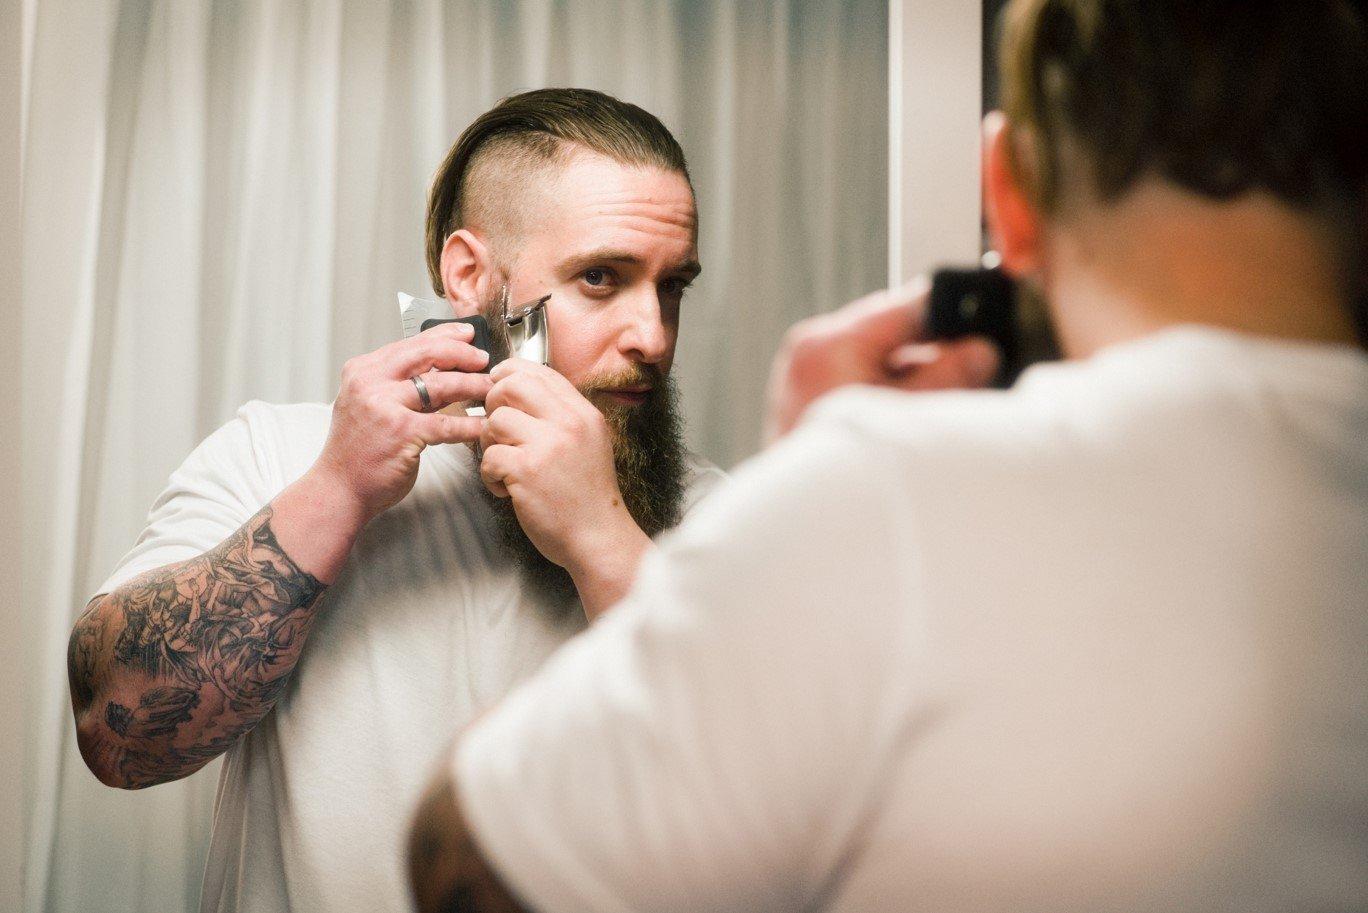 Pin By Alan Žunić On Svasta Beard Styles Hair And For Men